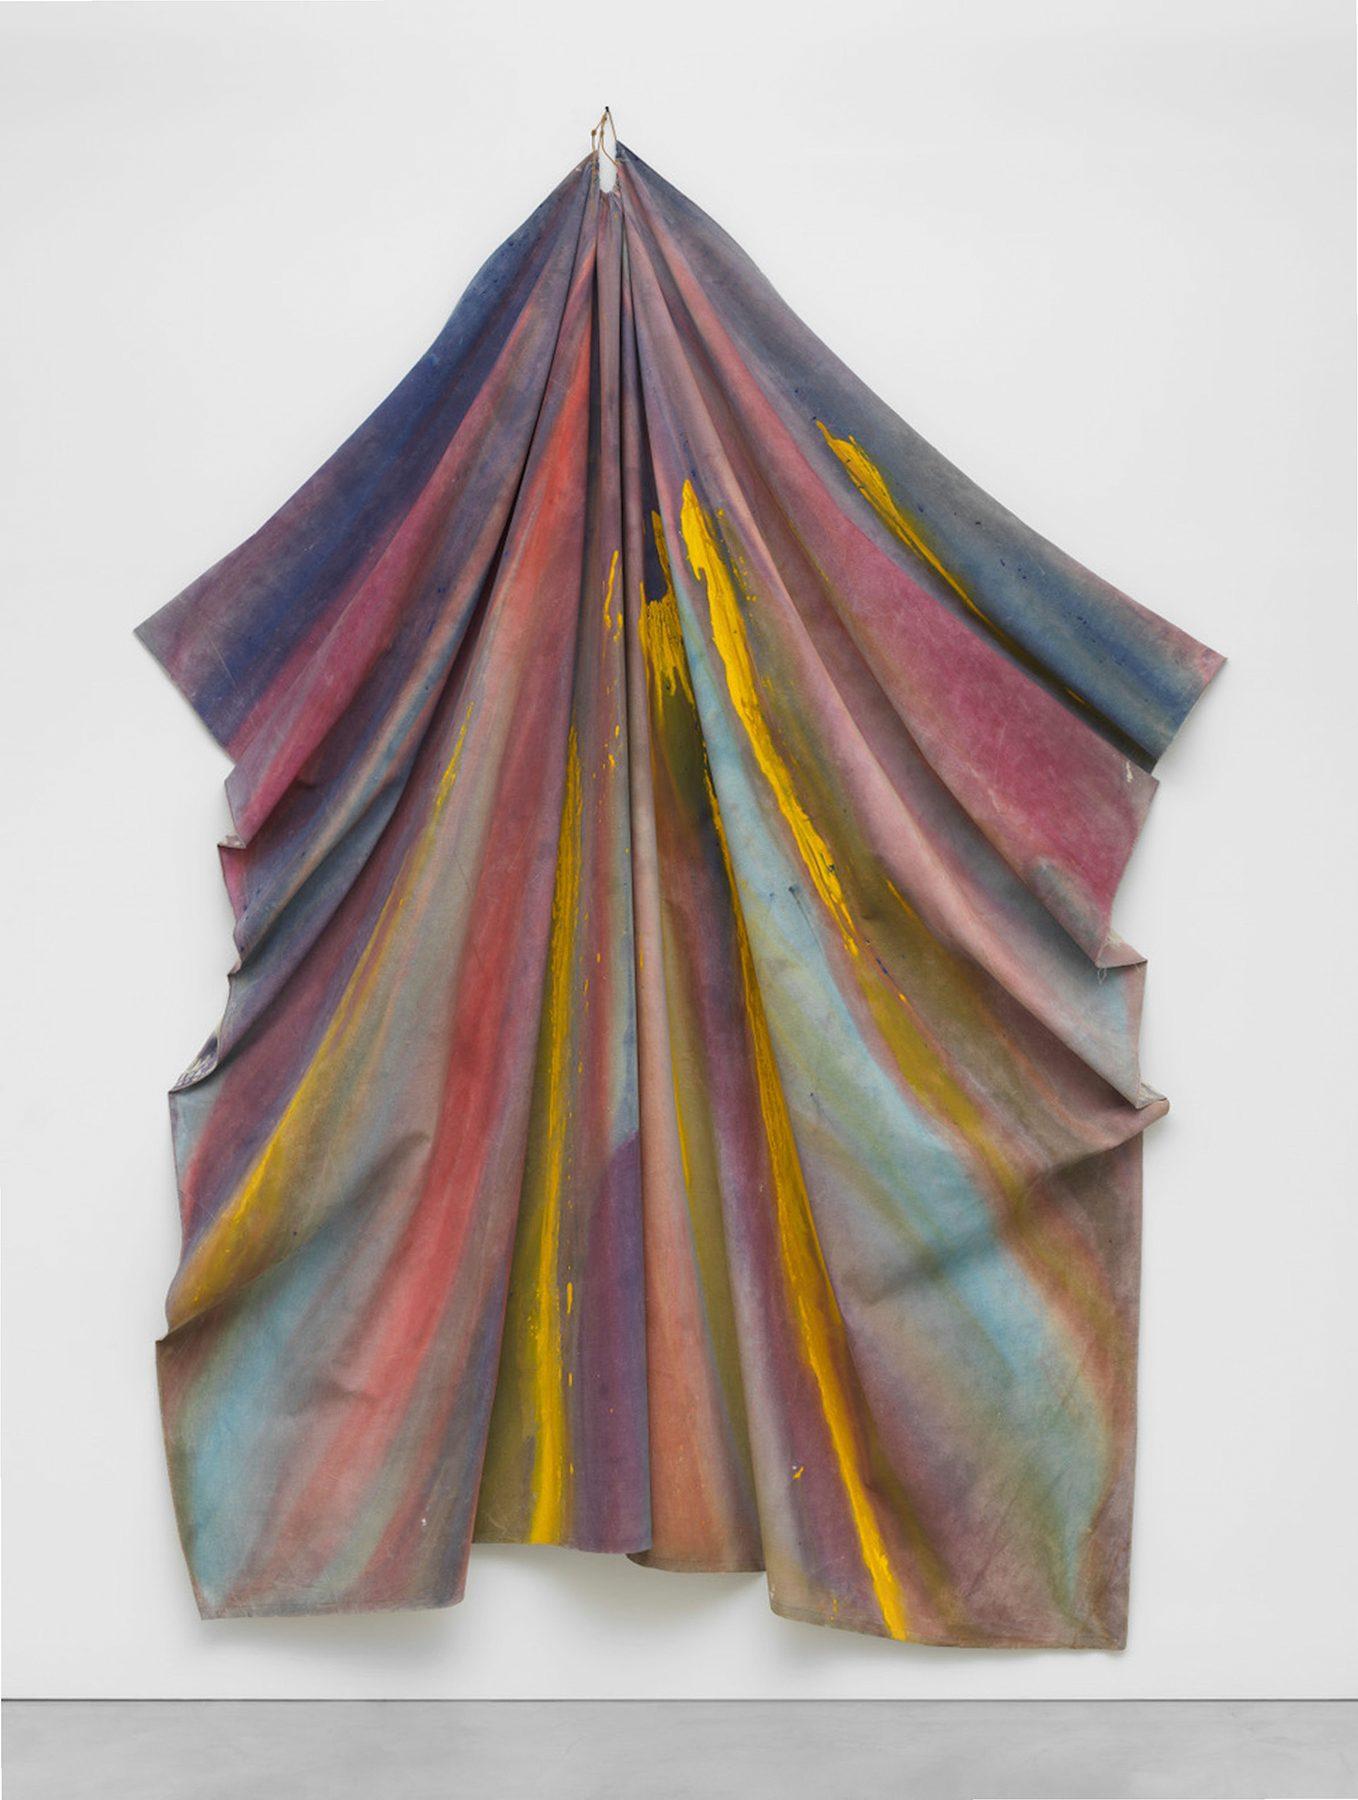 Sam Gilliam (b. 1933, Tupelo, Mississippi), Mazda, 1970, acrylic on canvas, installed: 135 × 90 in. (342.9 × 228.6 cm), Crystal Bridges Museum of American Art, Bentonville, Arkansas, 2020.12.